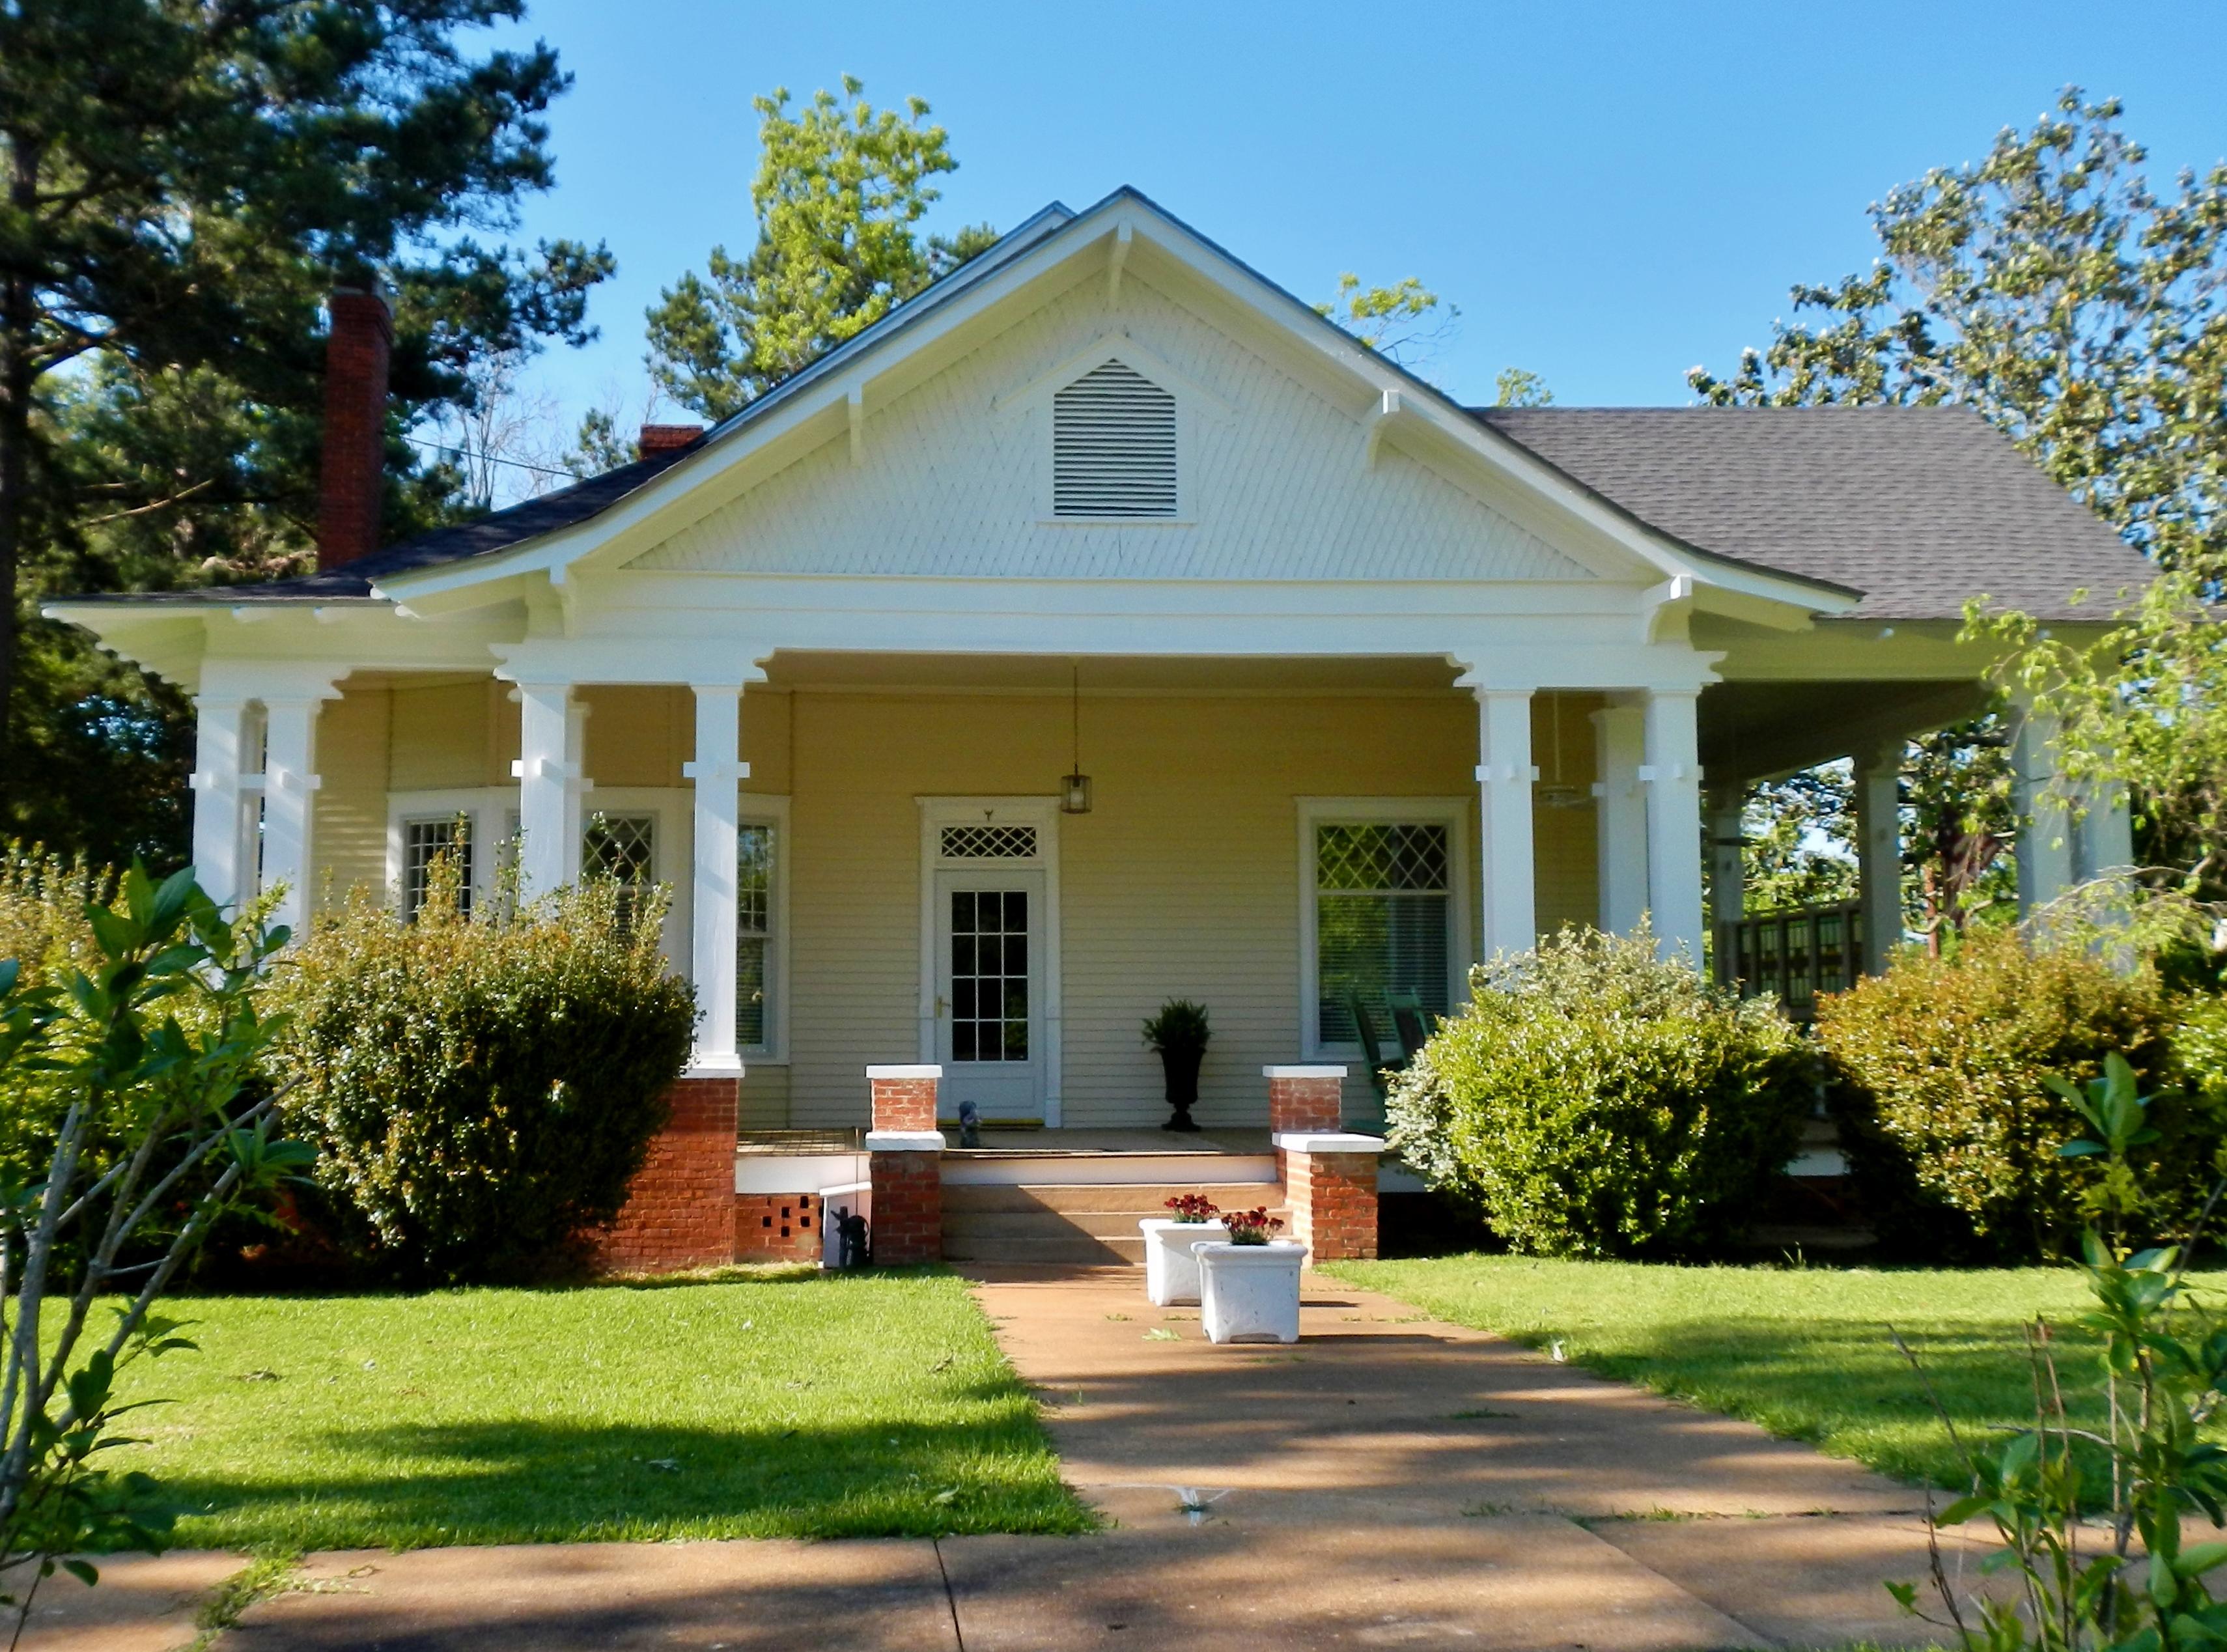 File:Arthur A. French House (c. 1914) (Richland, GA).JPG - Wikimedia ...